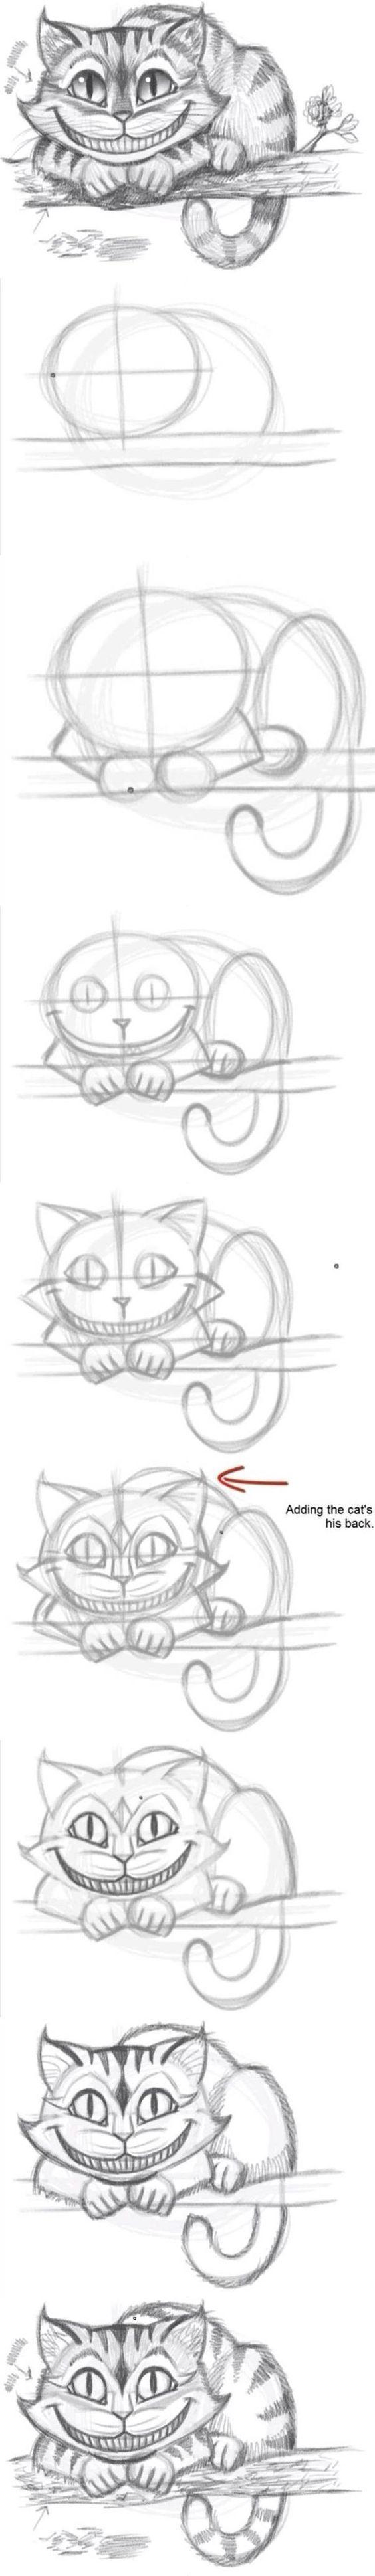 Meine Disney Zeichnung – 15ed087a2f3b9bbe582441c3567d64de.jpg 600×4.126 píxeles